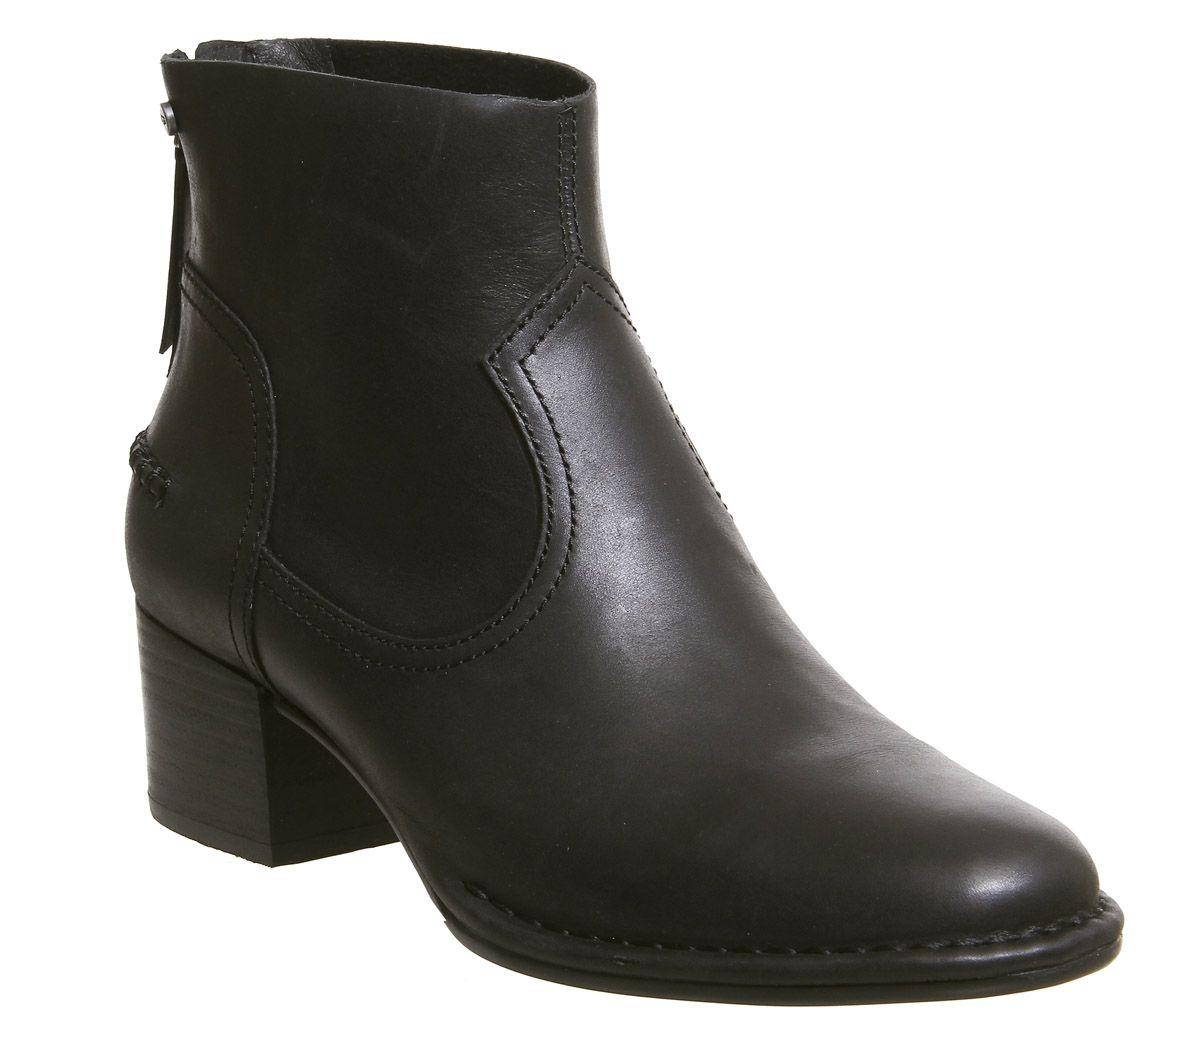 41c5251e5c9 Bandara Ankle Boots